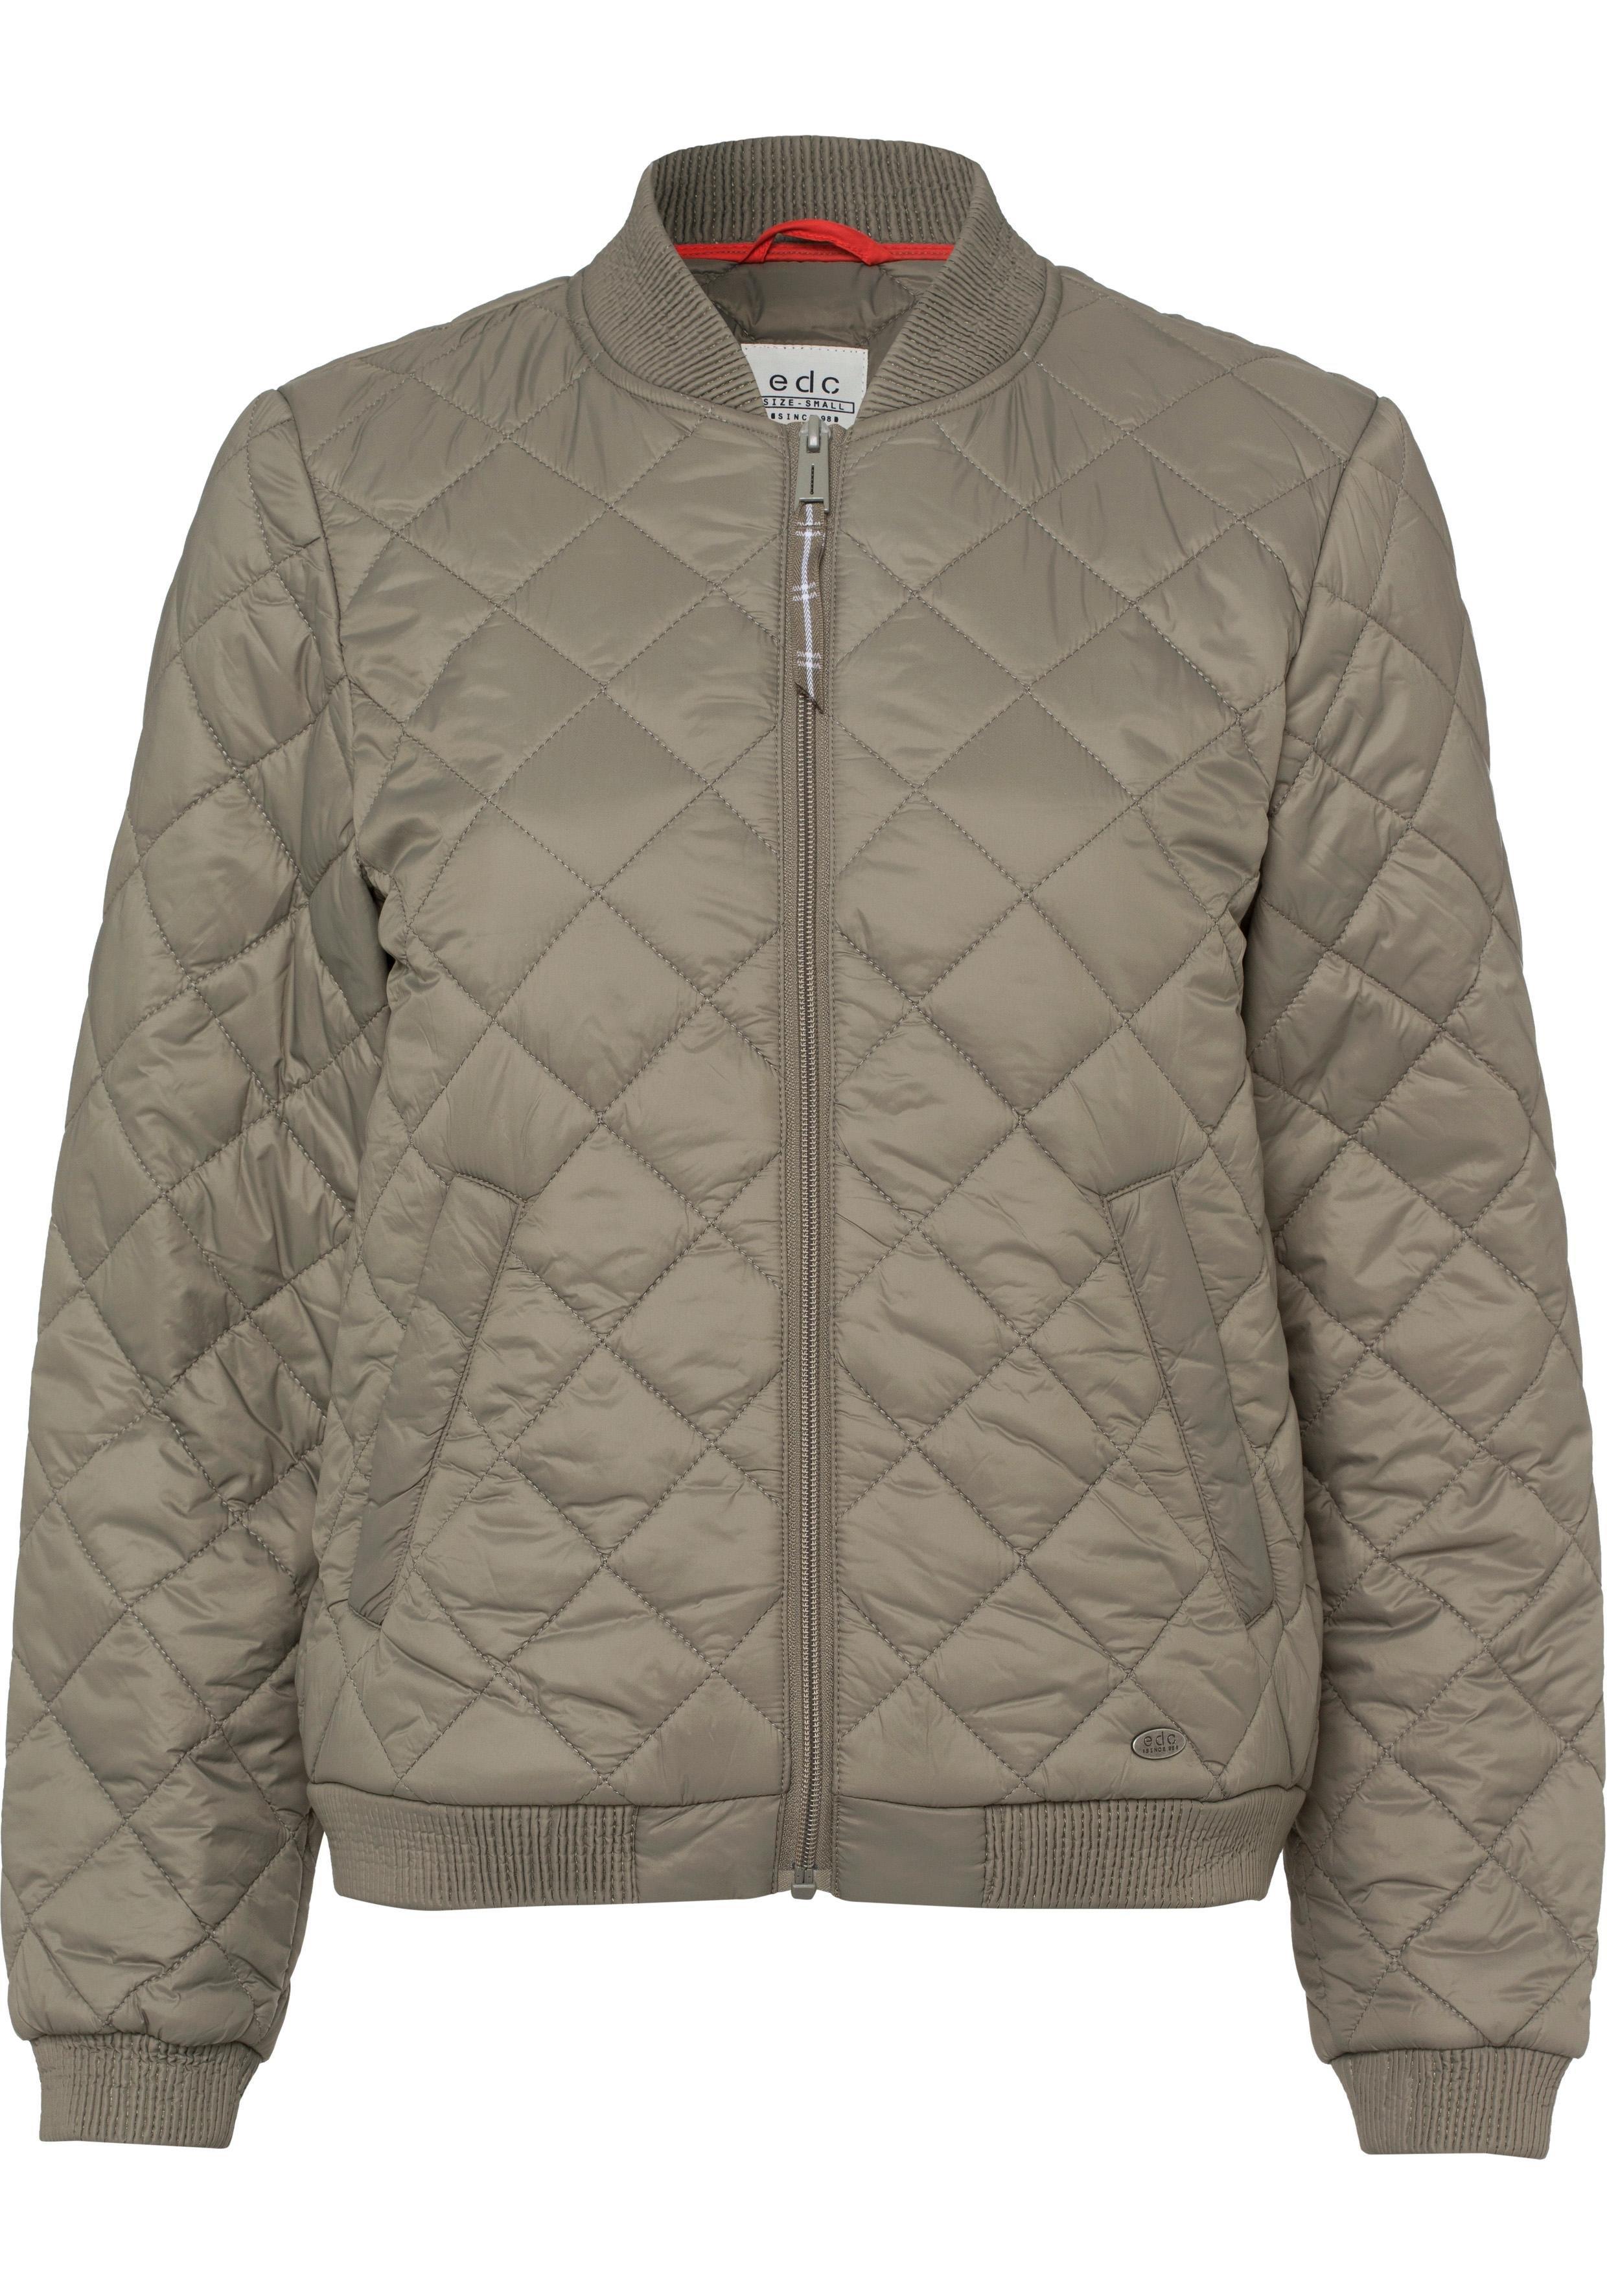 edc by esprit gewatteerde jas nu online bestellen